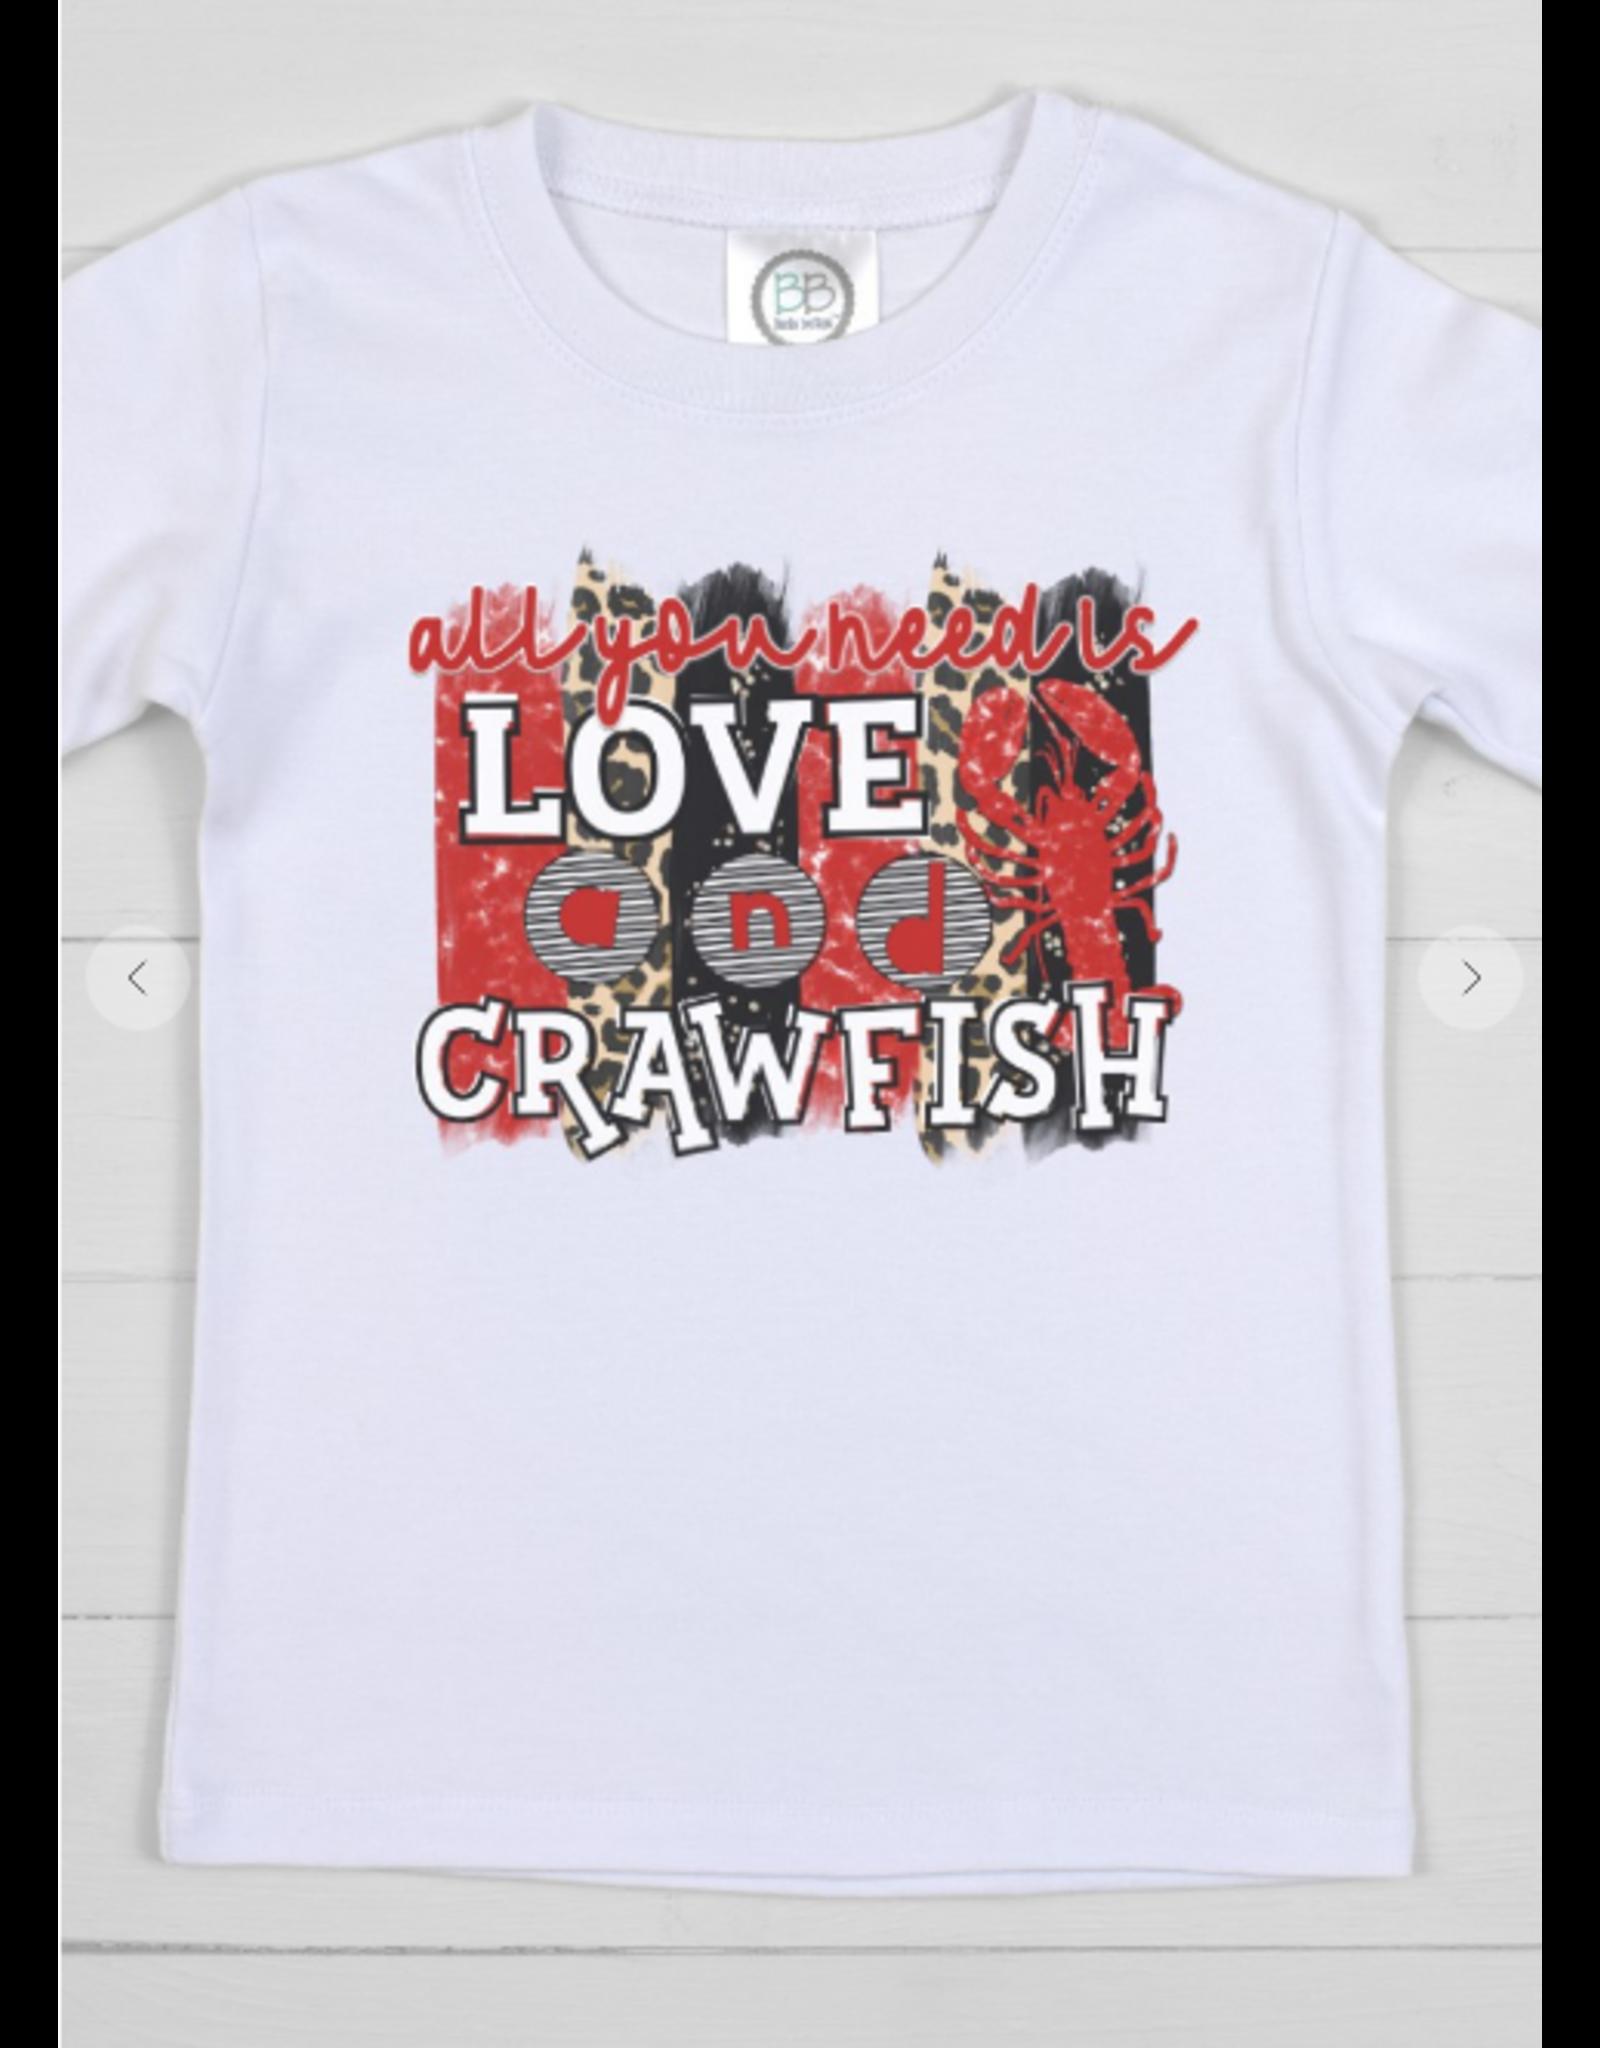 All You Need is Love & Crawfish TShirt